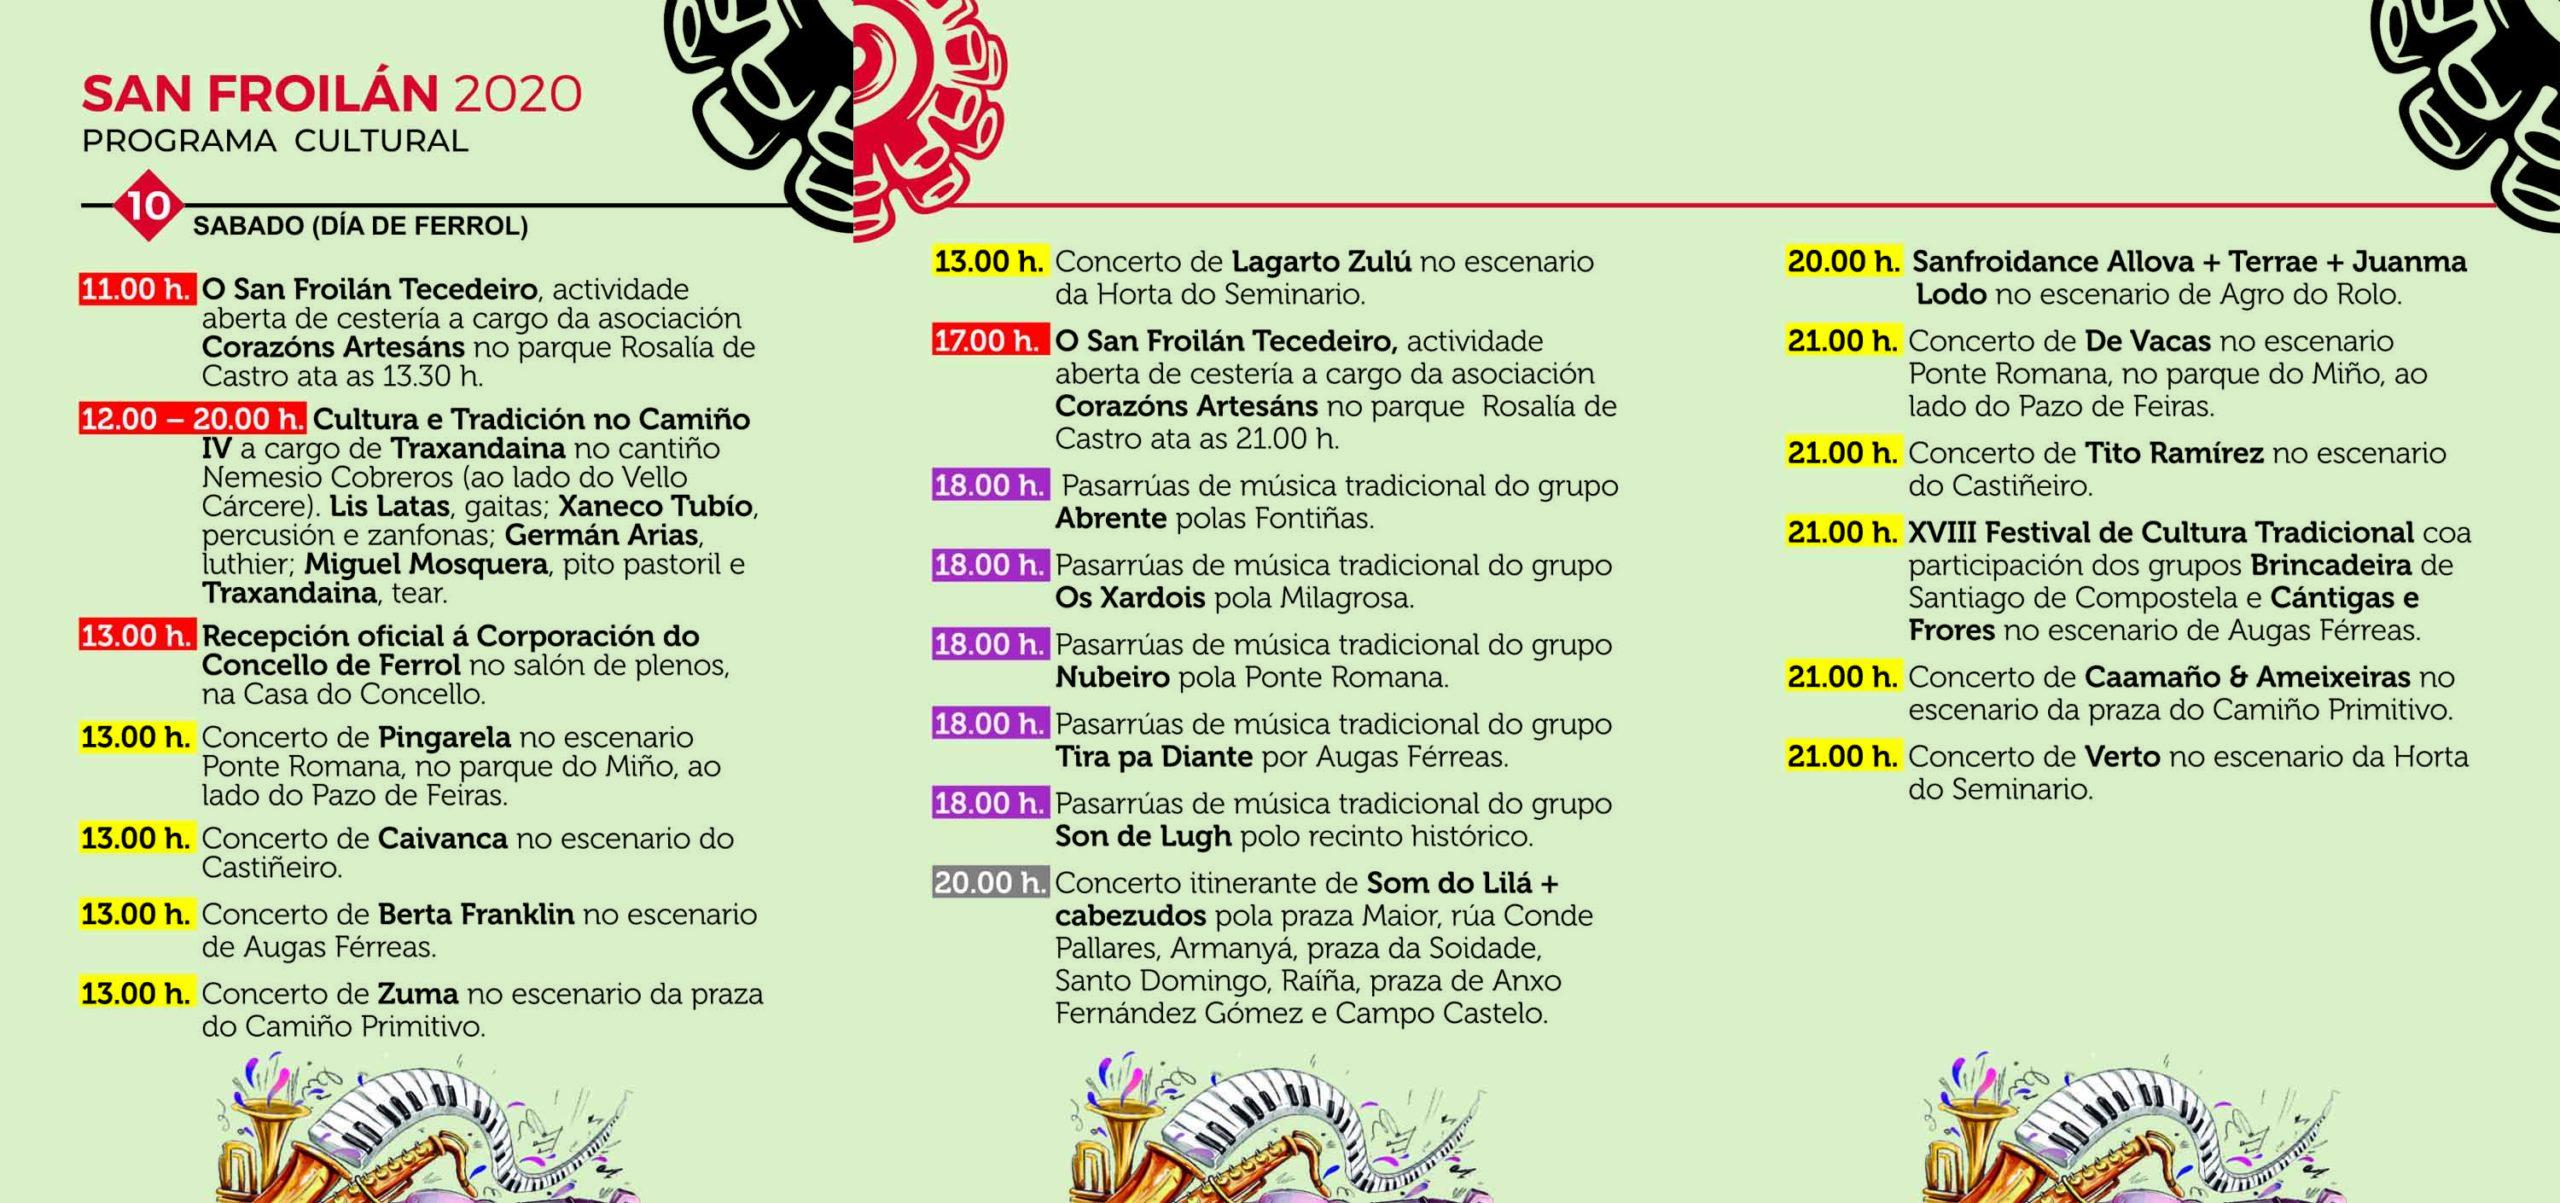 San Froilán 2020 - Programa